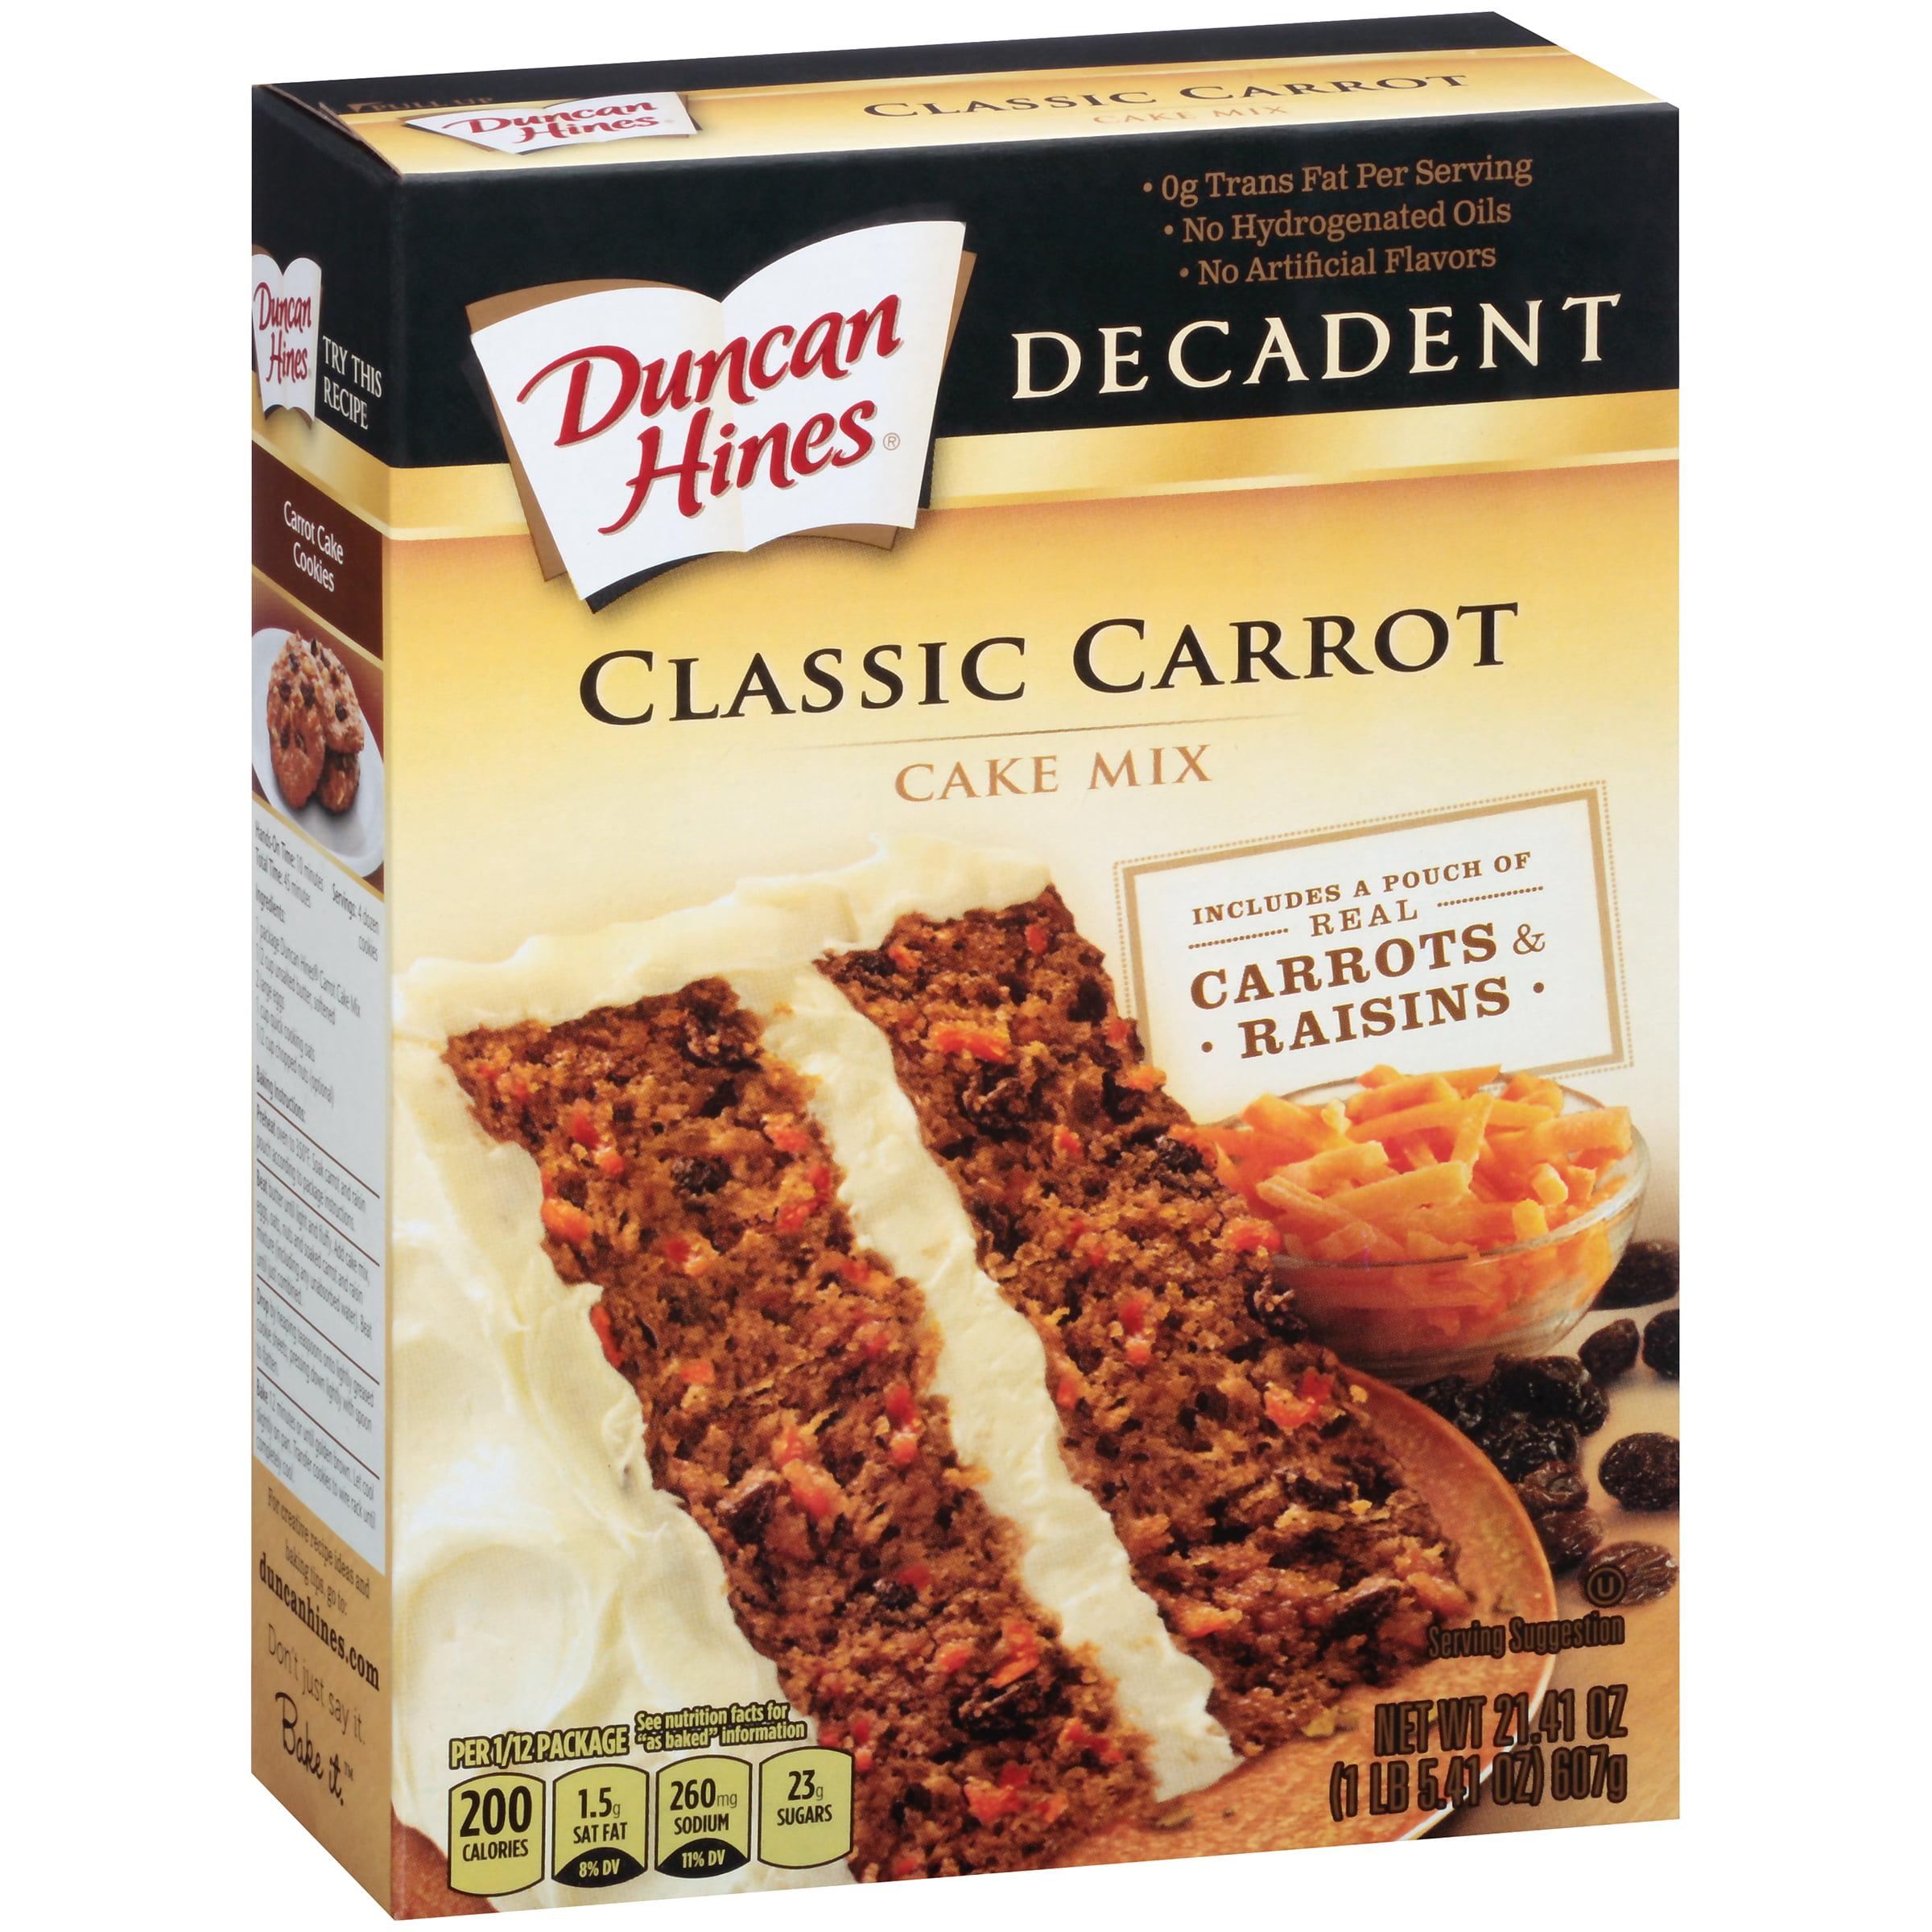 Duncan Hines�� Decadent Classic Carrot Cake Mix 21.41 oz. Box